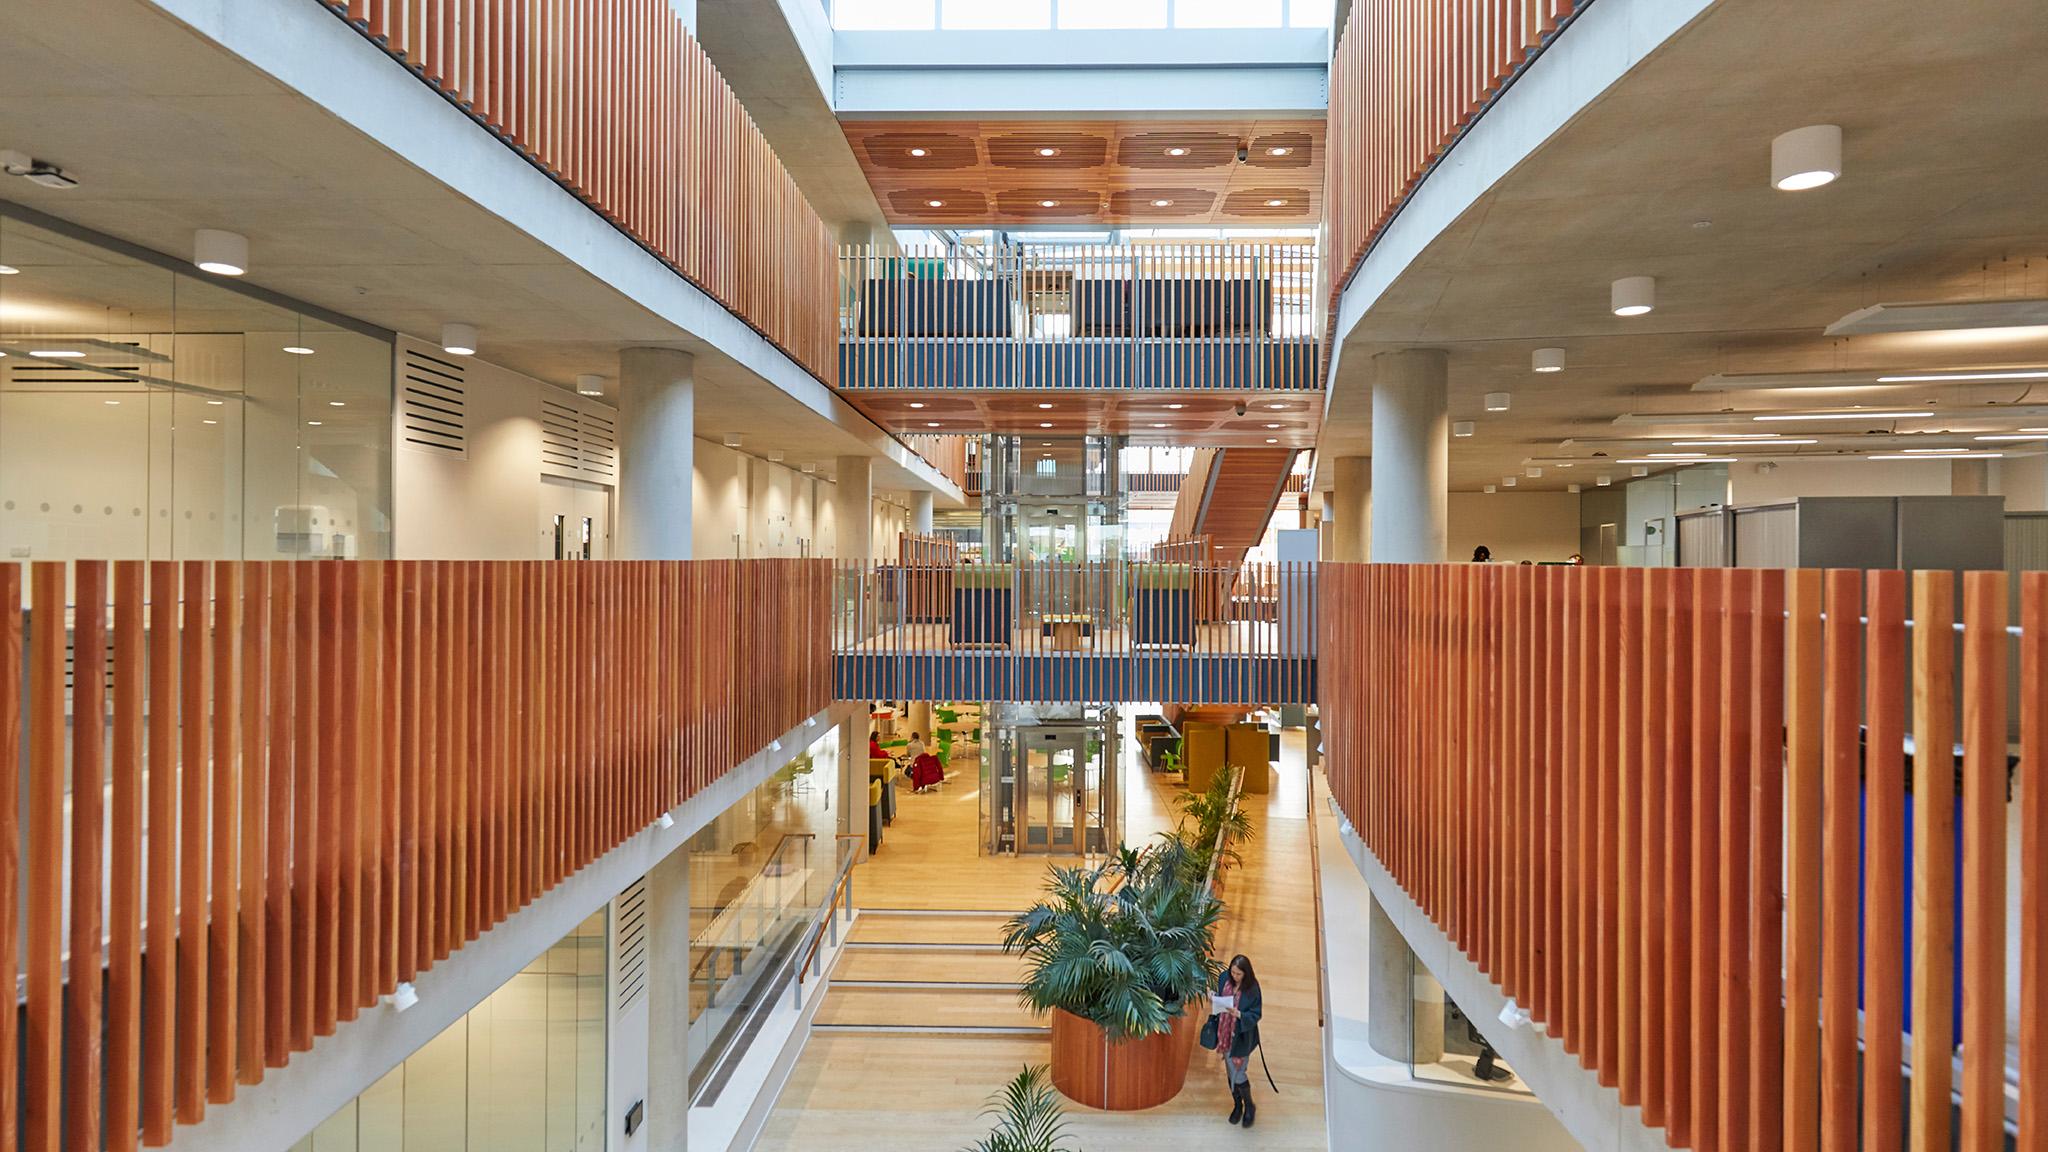 Alder Hey Children's Hospital: Institute in the Park